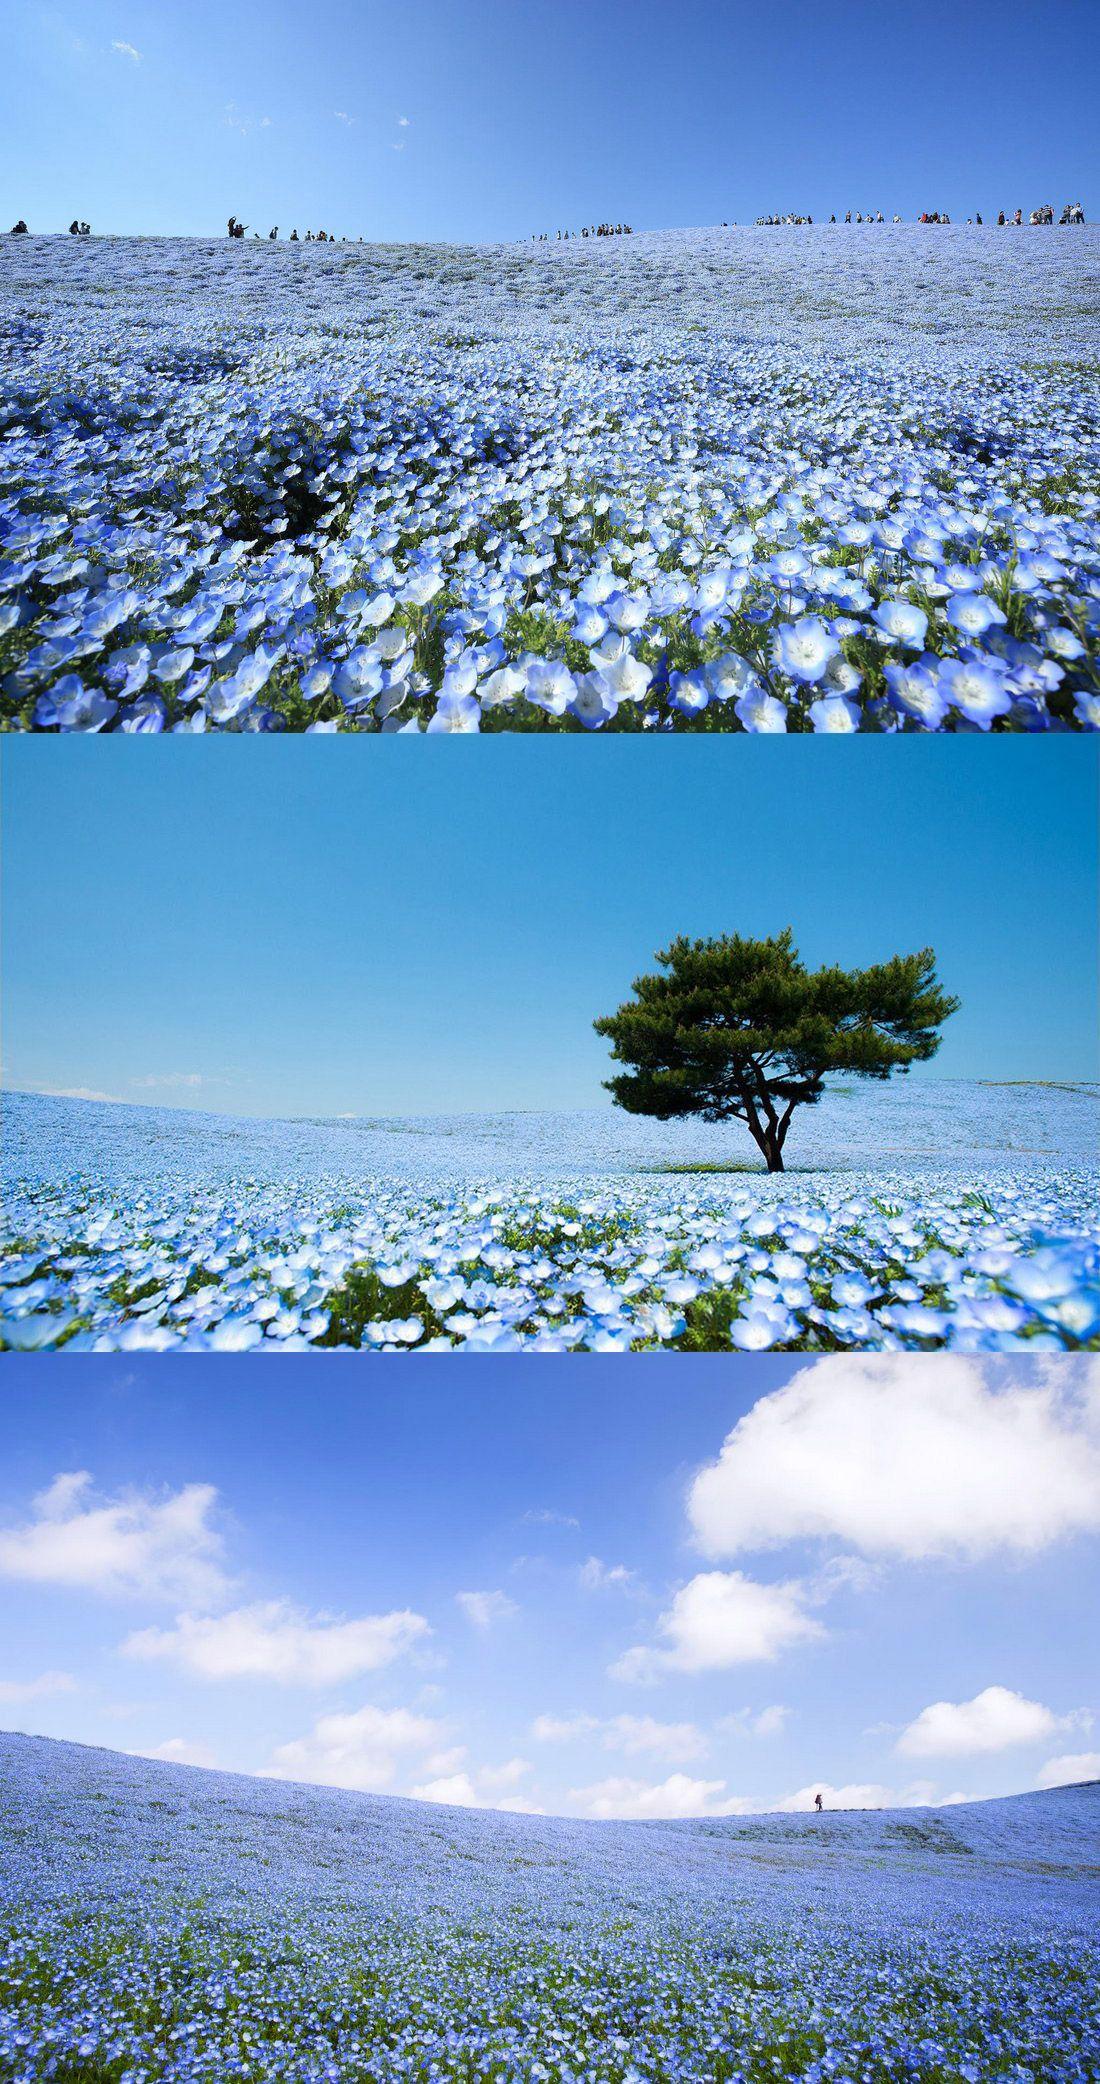 Go See 45 Million Baby Blue Eye Flowers At Hitachi Seaside Park In